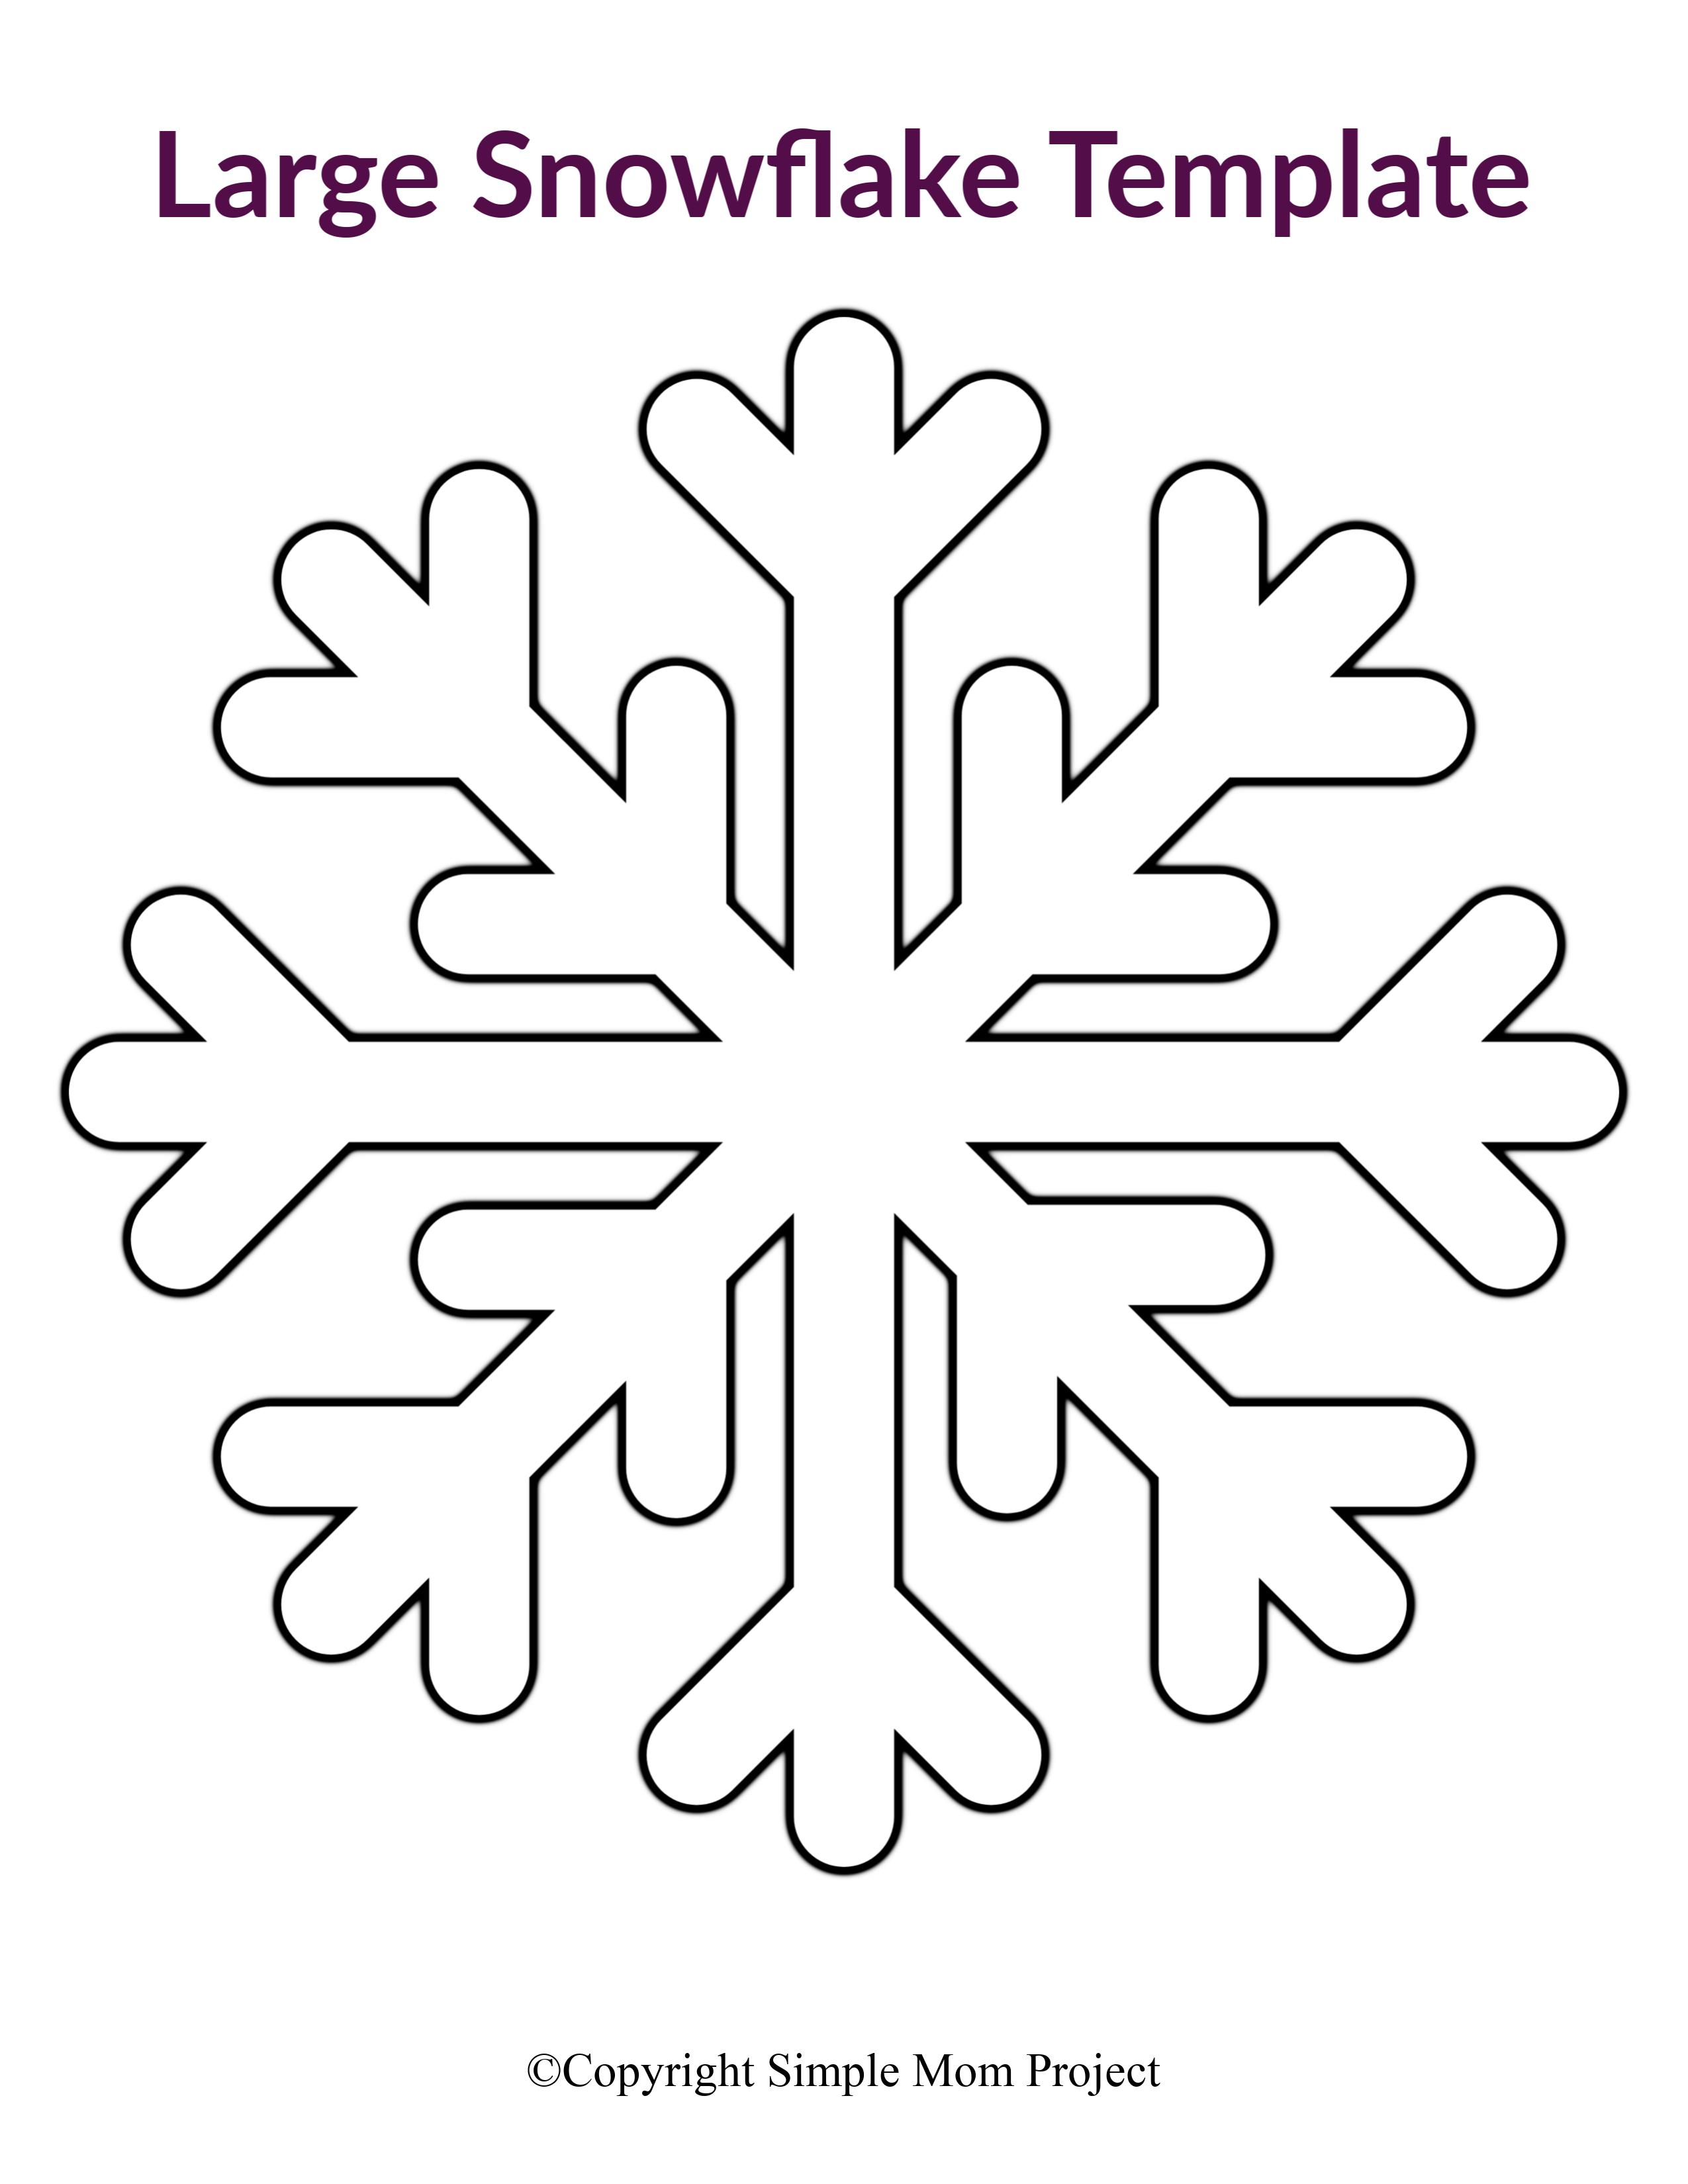 8 Free Printable Large Snowflake Templates Snowflake Template Paper Snowflake Patterns Printable Snowflake Template